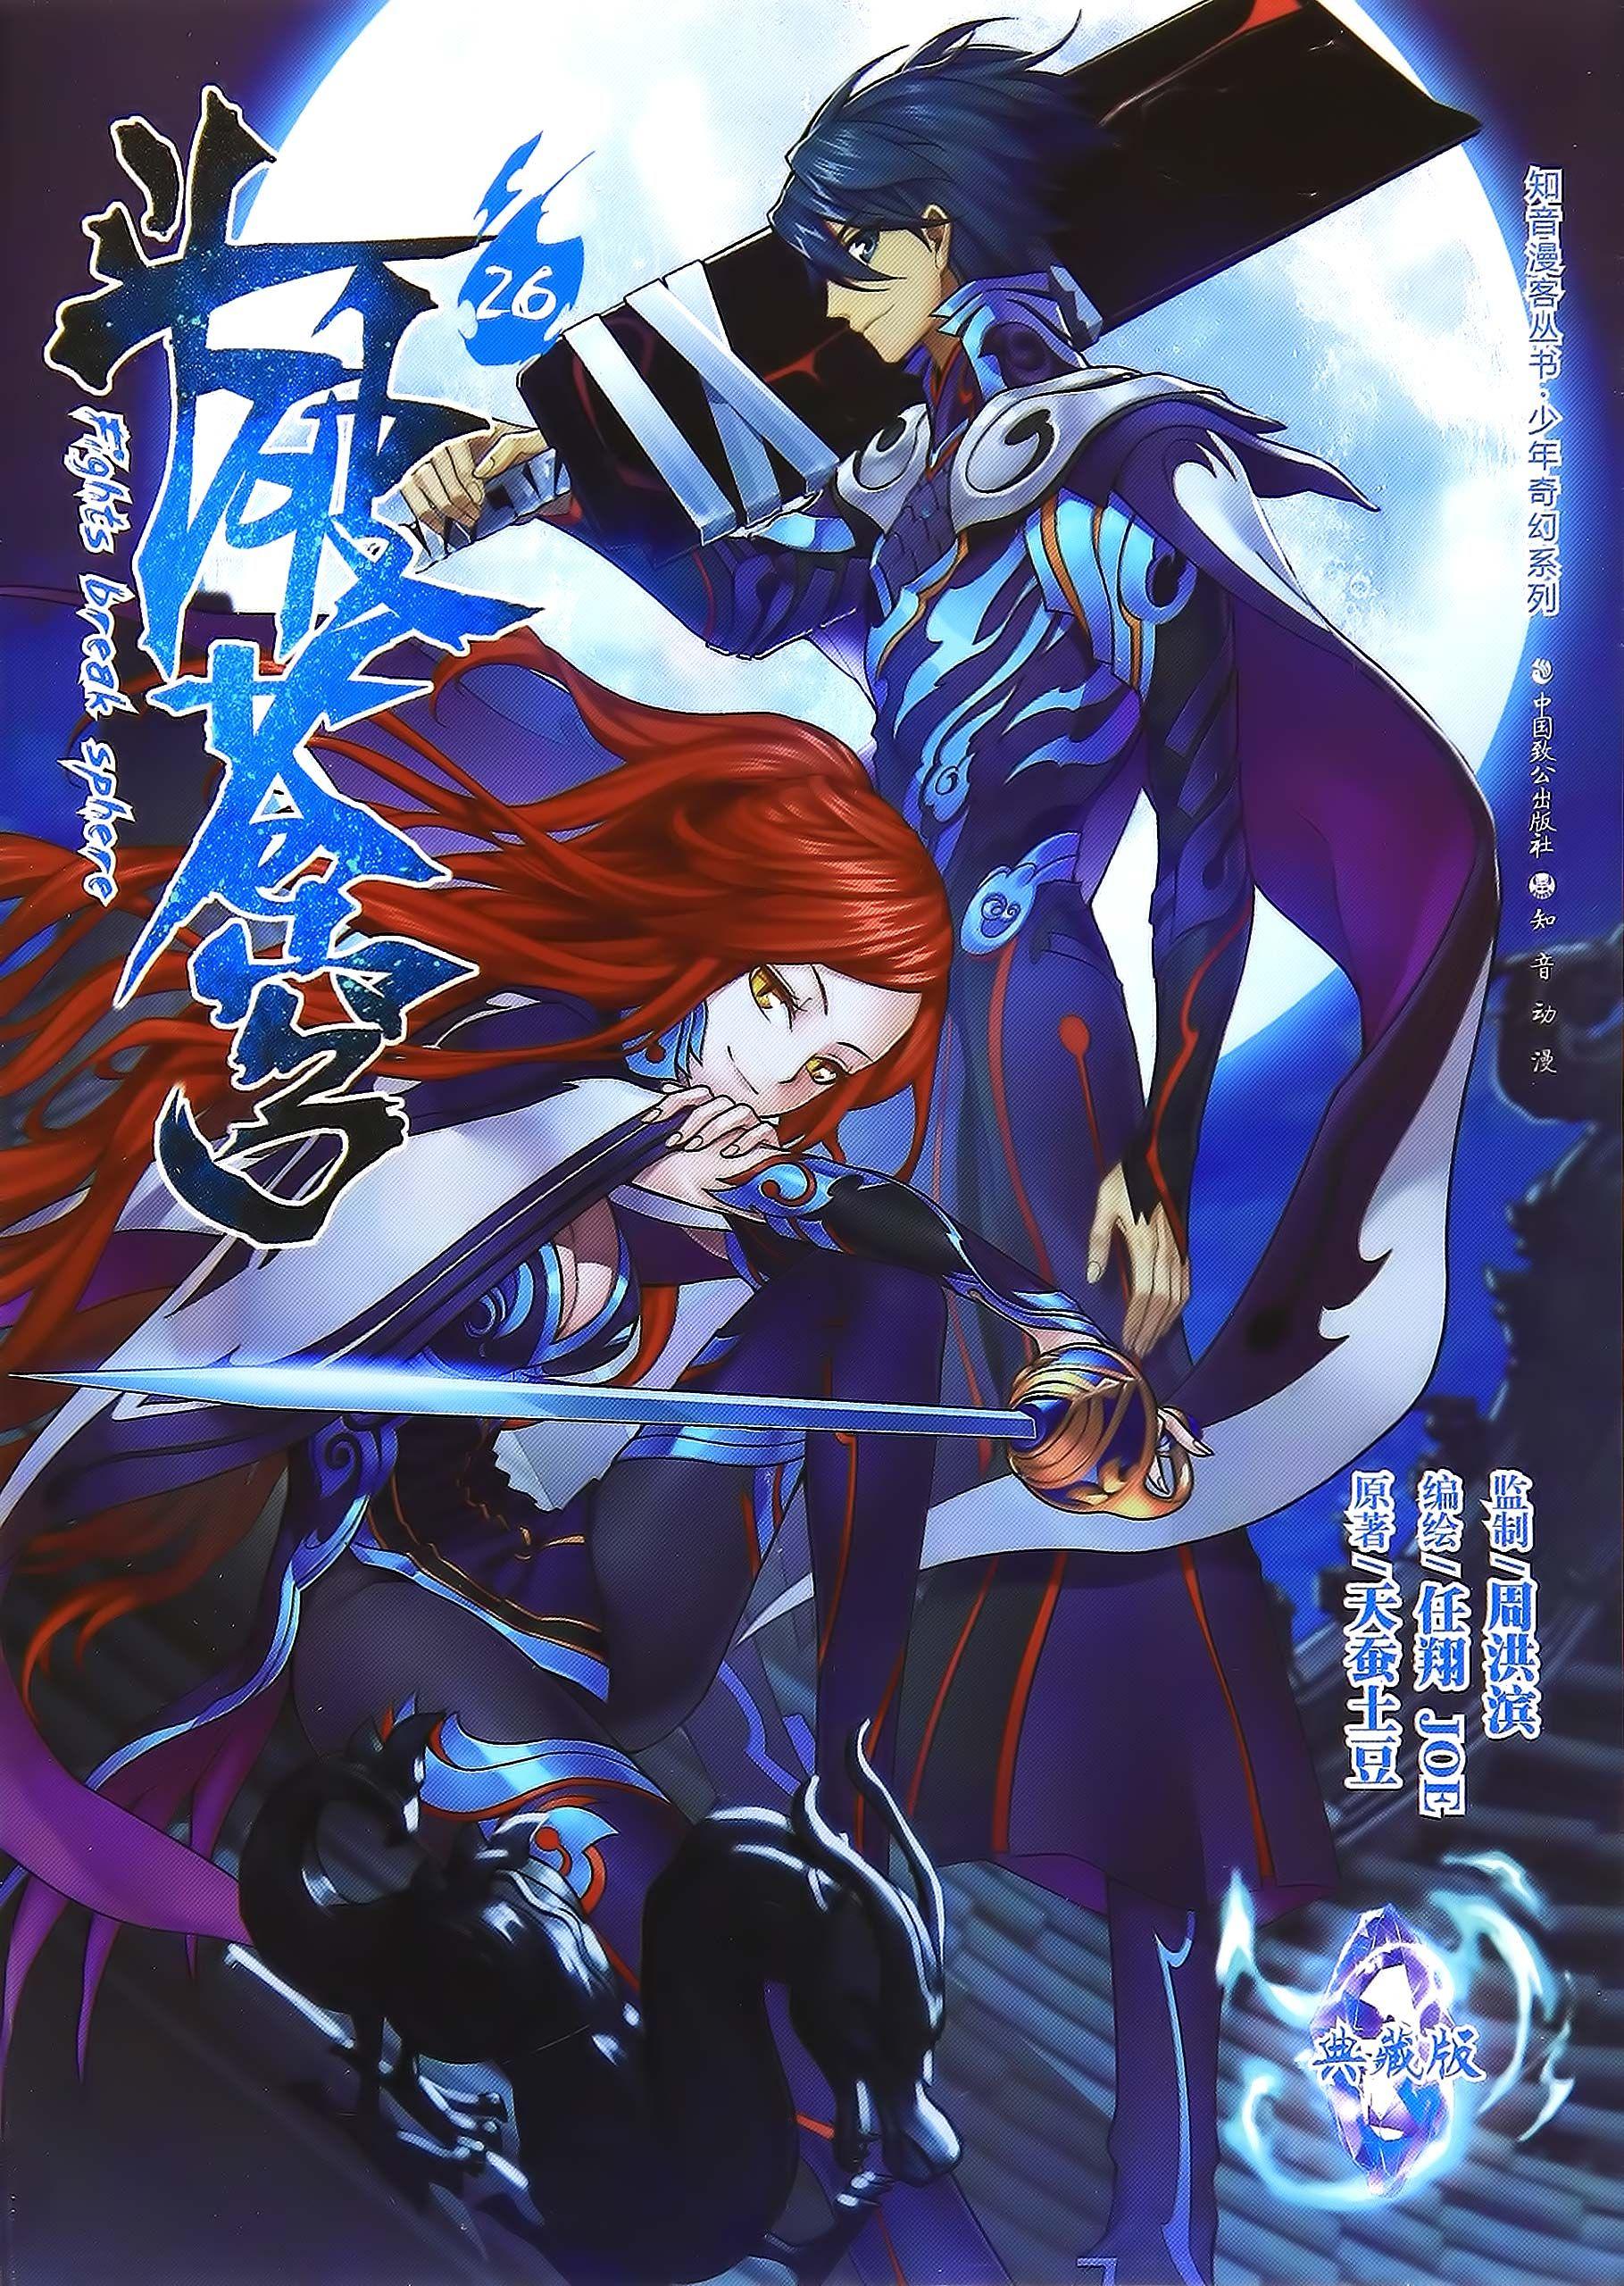 Fights Break Sphere Title Mangadex Anime Animacao